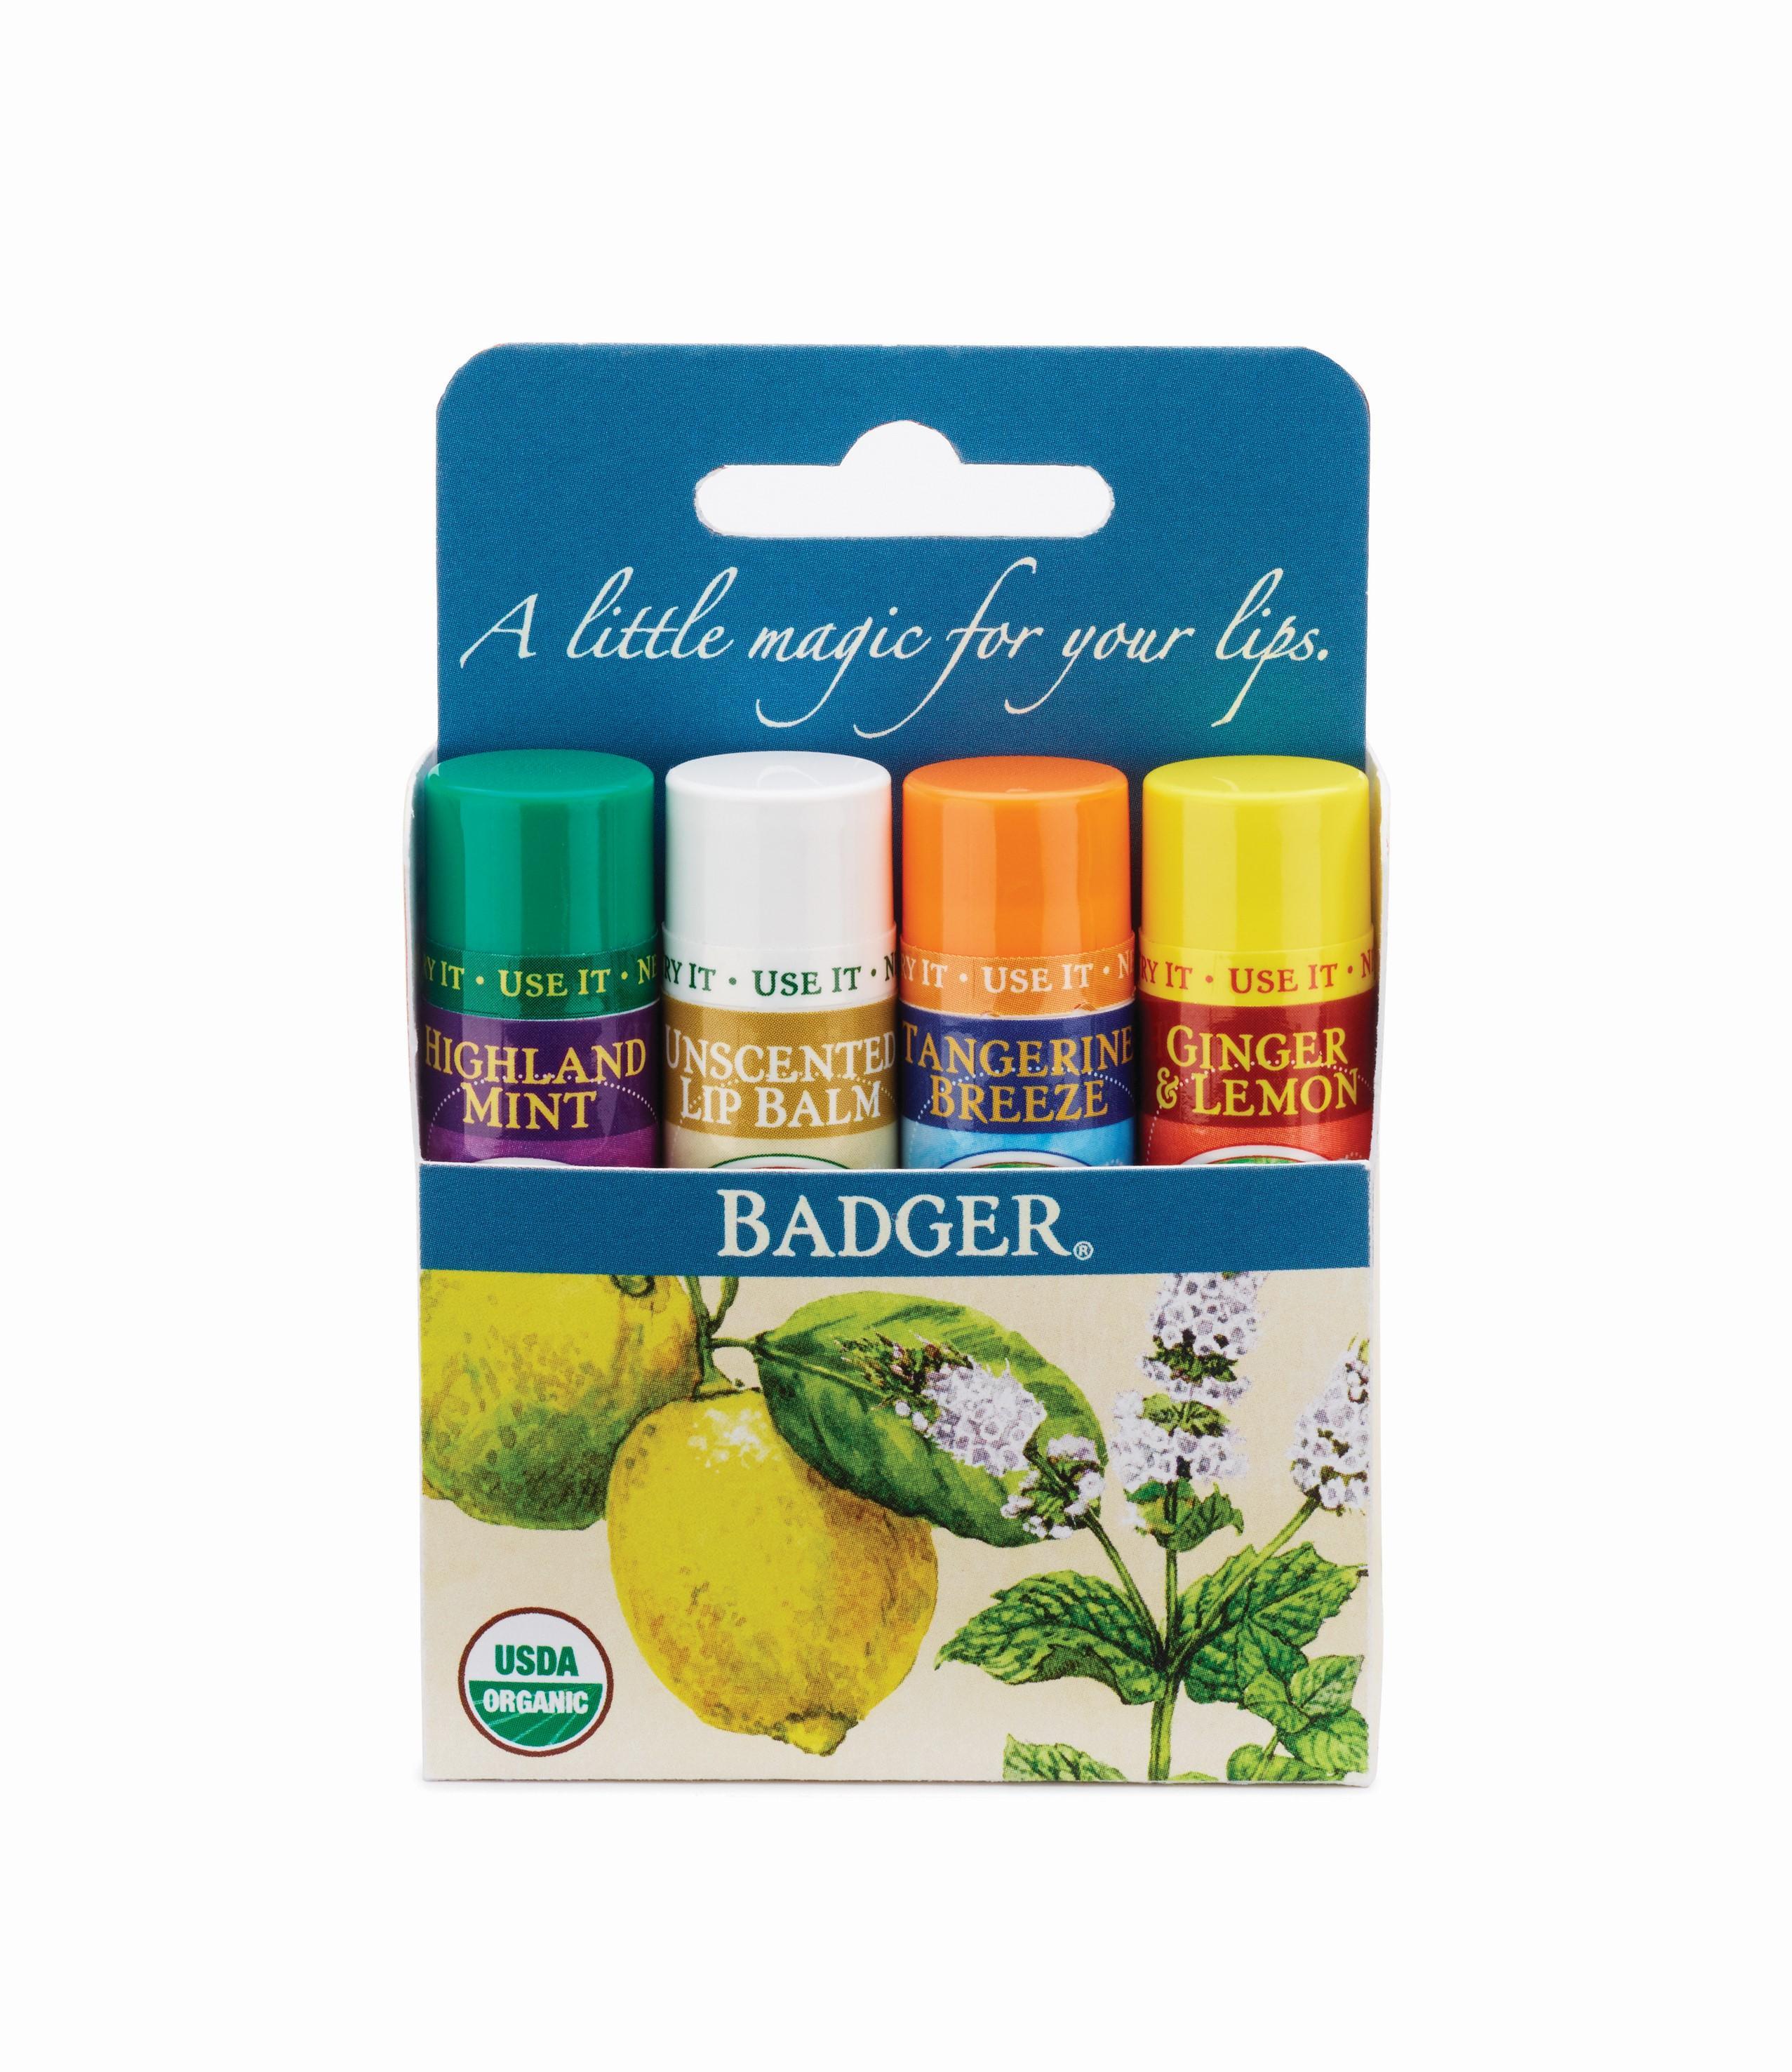 Badger - Certified Organic Lip Balm Stick Pink Grapefruit - 0.15 oz. (pack of 1) Alba Botanica Acnedote, Deep Clean Astringent 6 oz (Pack of 2)